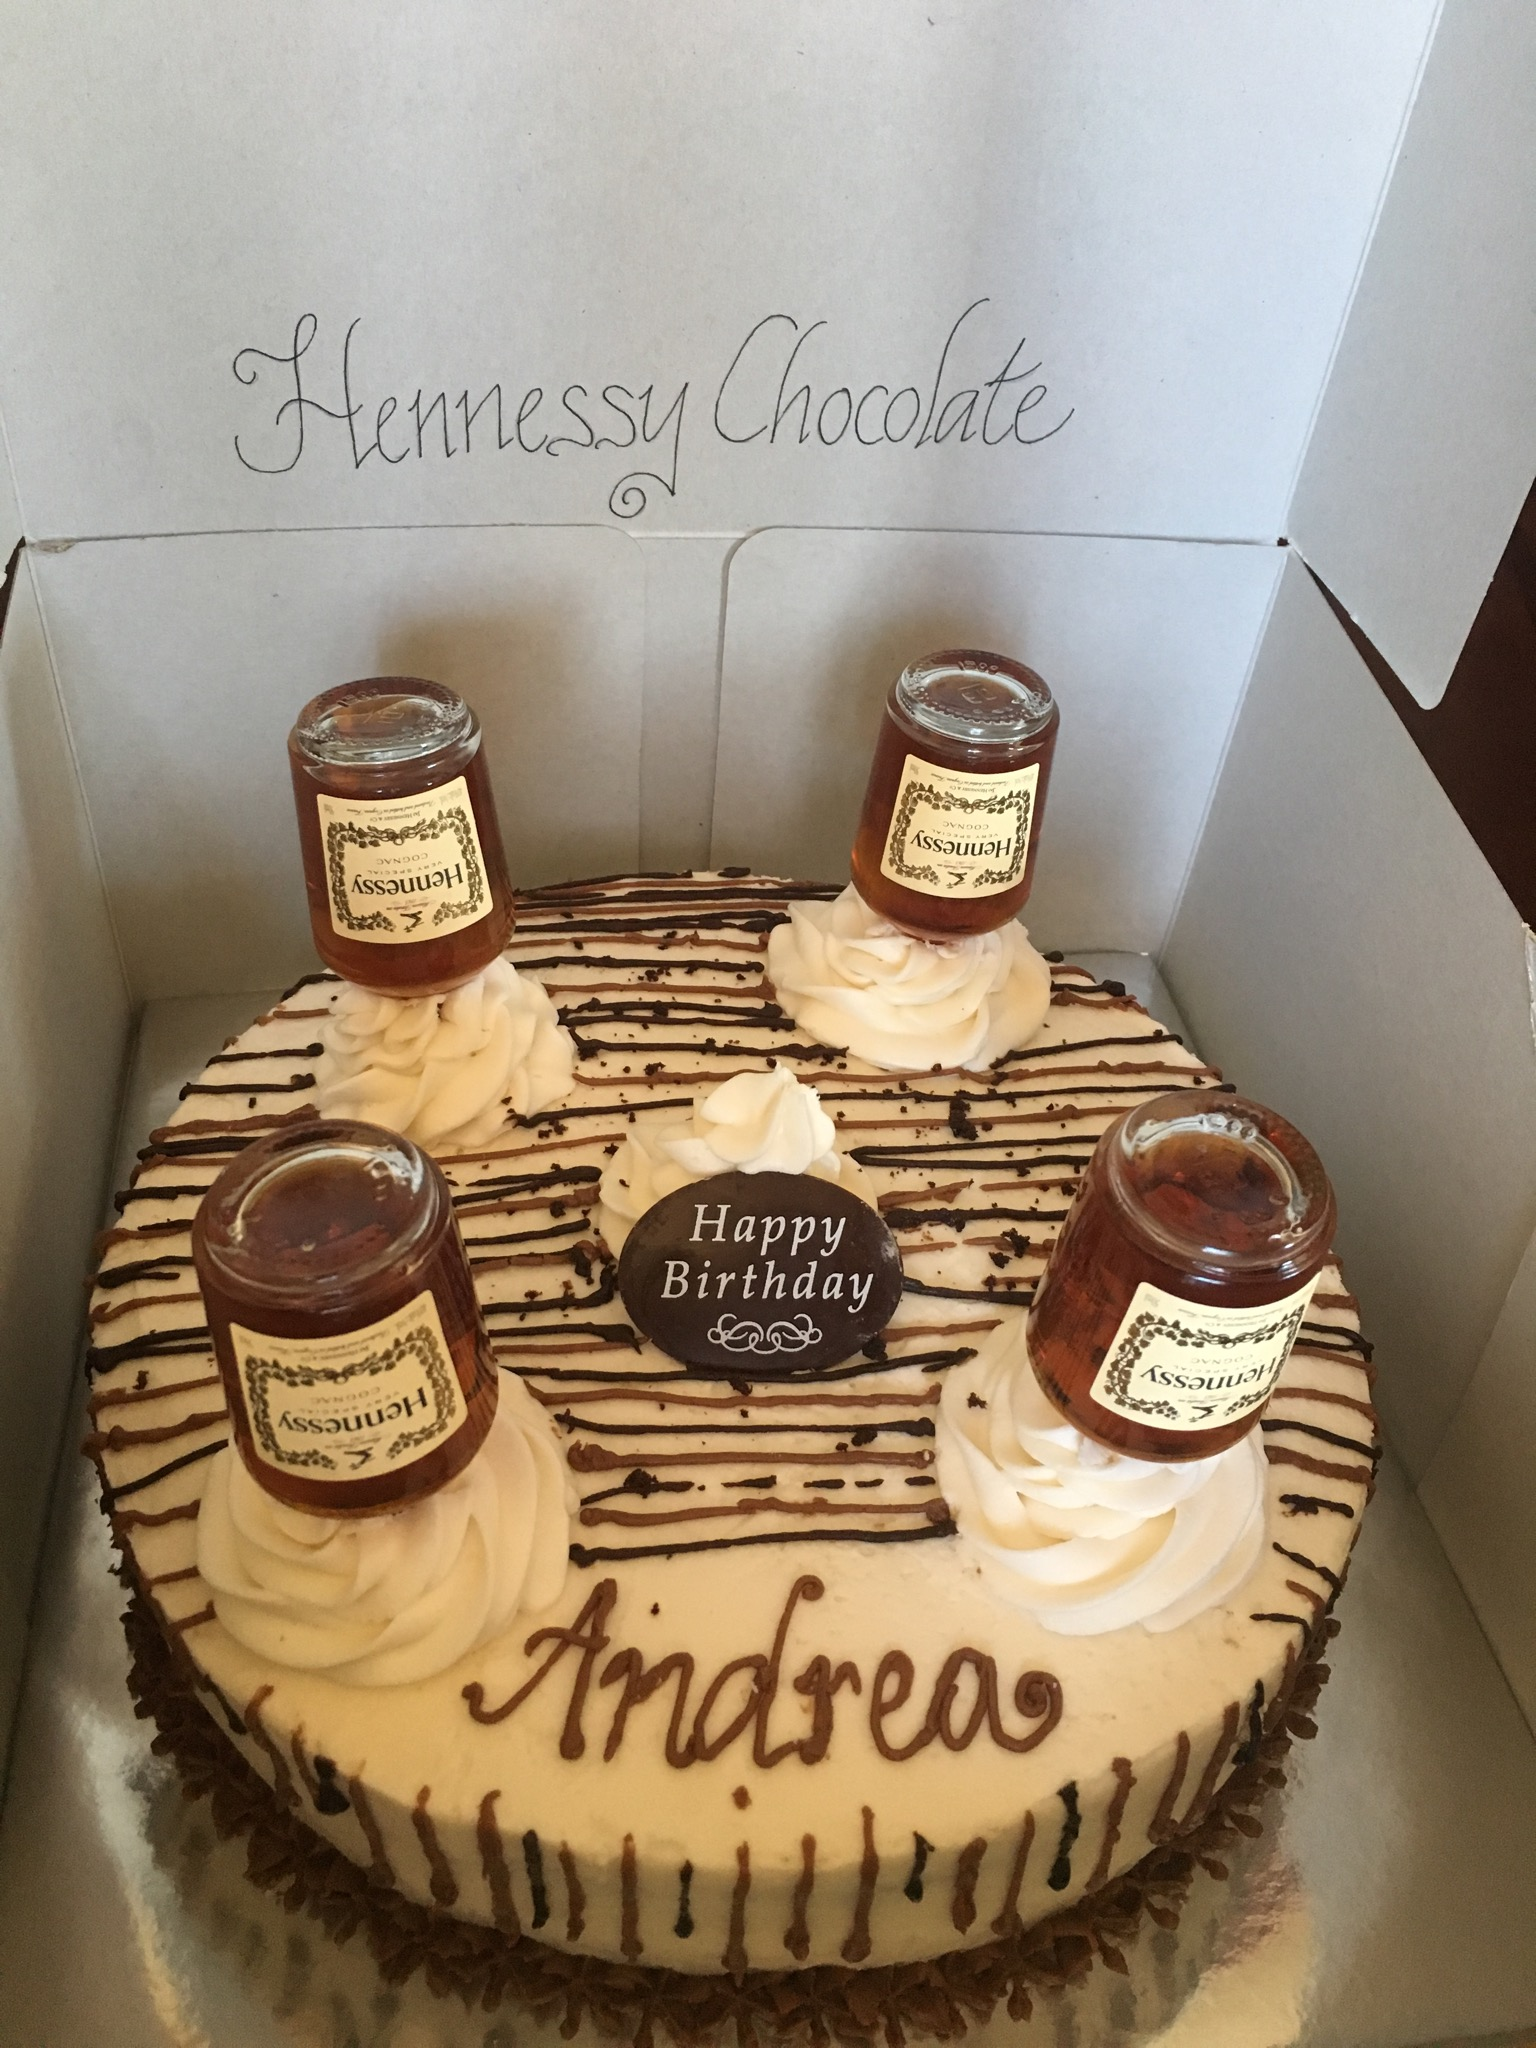 Sensational Hennessycustom Bottle Cake Wasted Desserts Funny Birthday Cards Online Alyptdamsfinfo